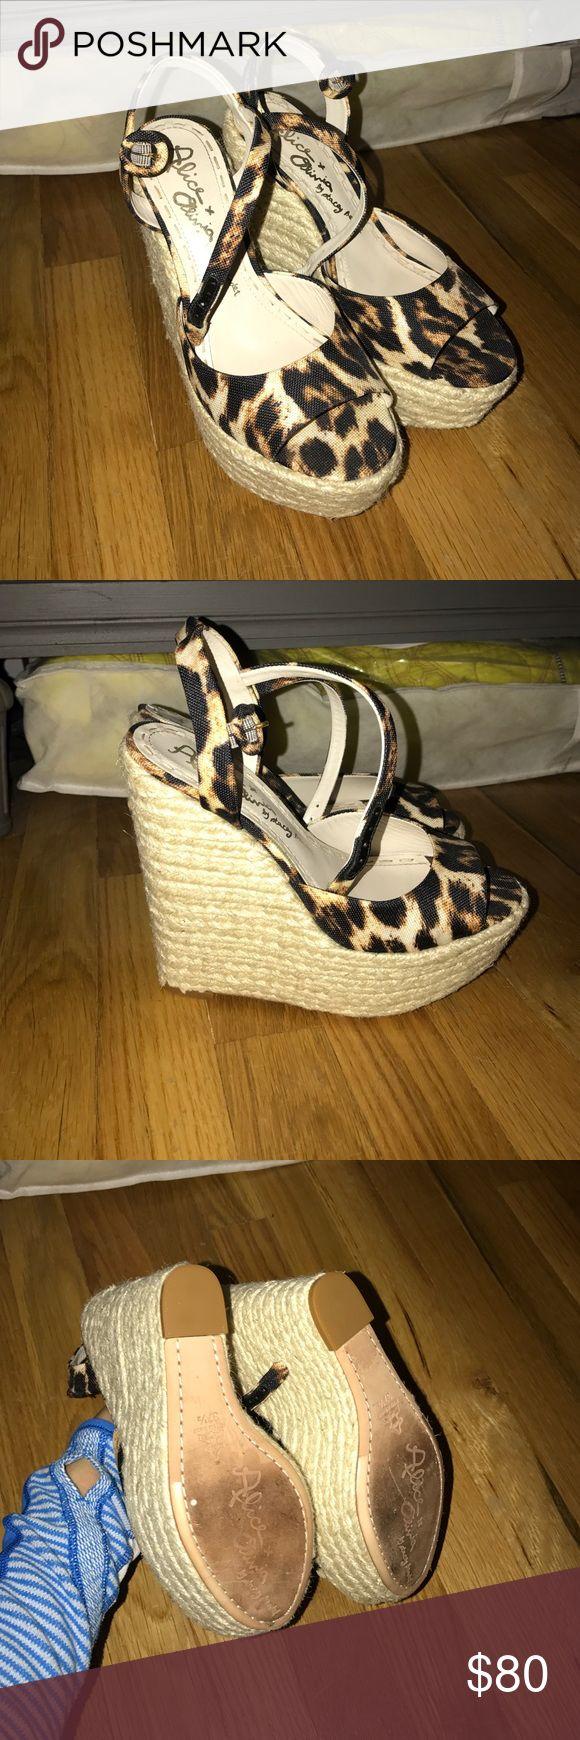 Alice + Olivia leopard wedges Gorgeous summer wedges! Worn once. Alice + Olivia Shoes Wedges